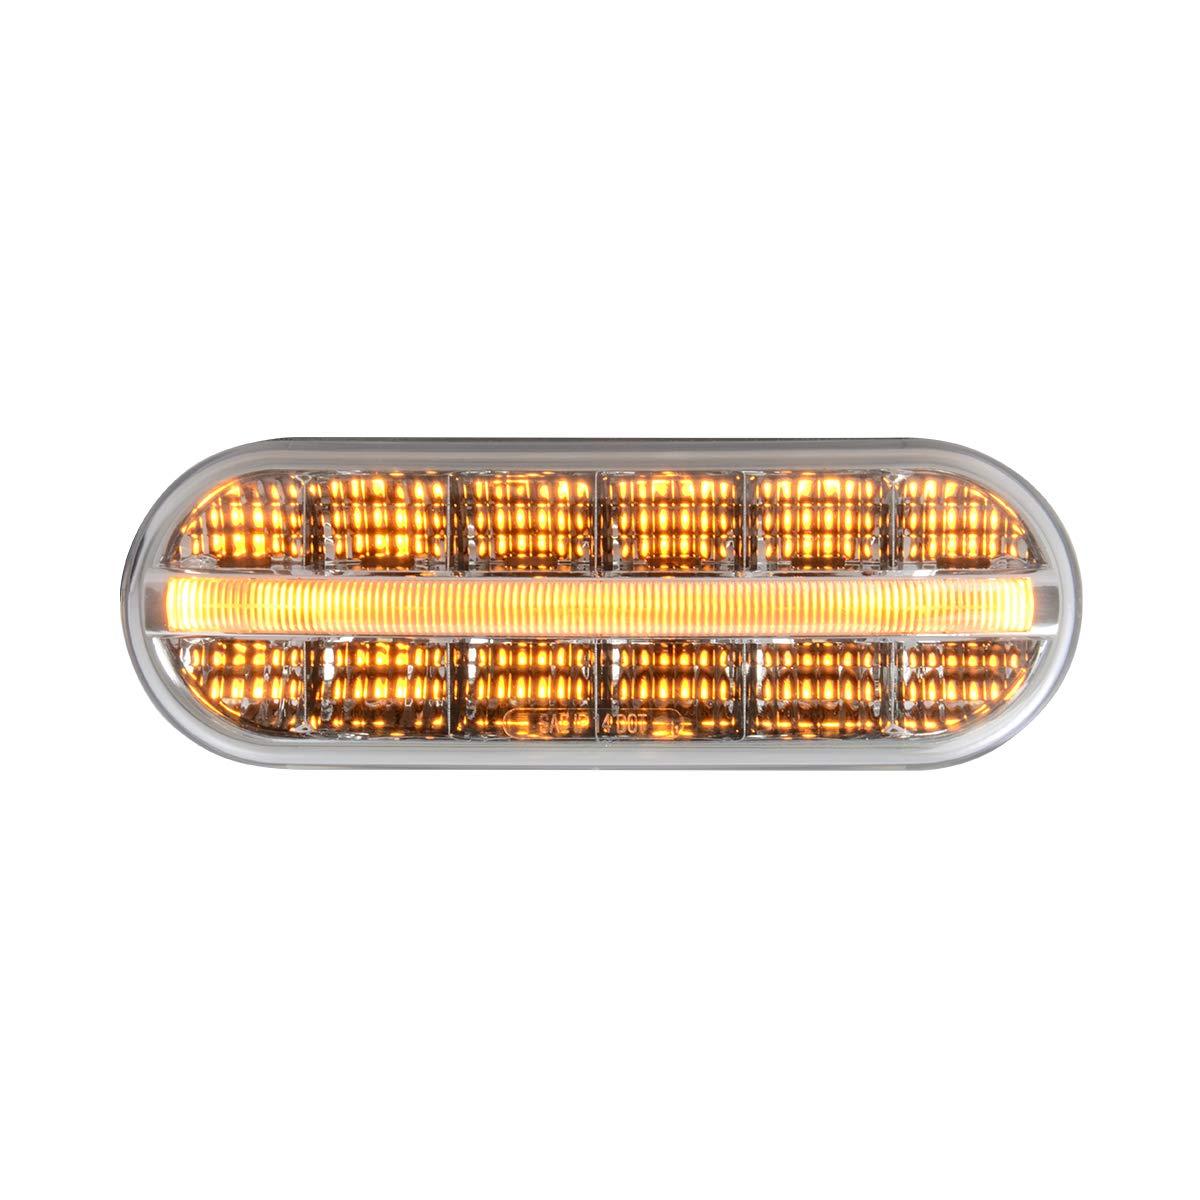 GG Grand General 74851 Sealed Light Oval Prime Spyder Amber//Clear 14 LED